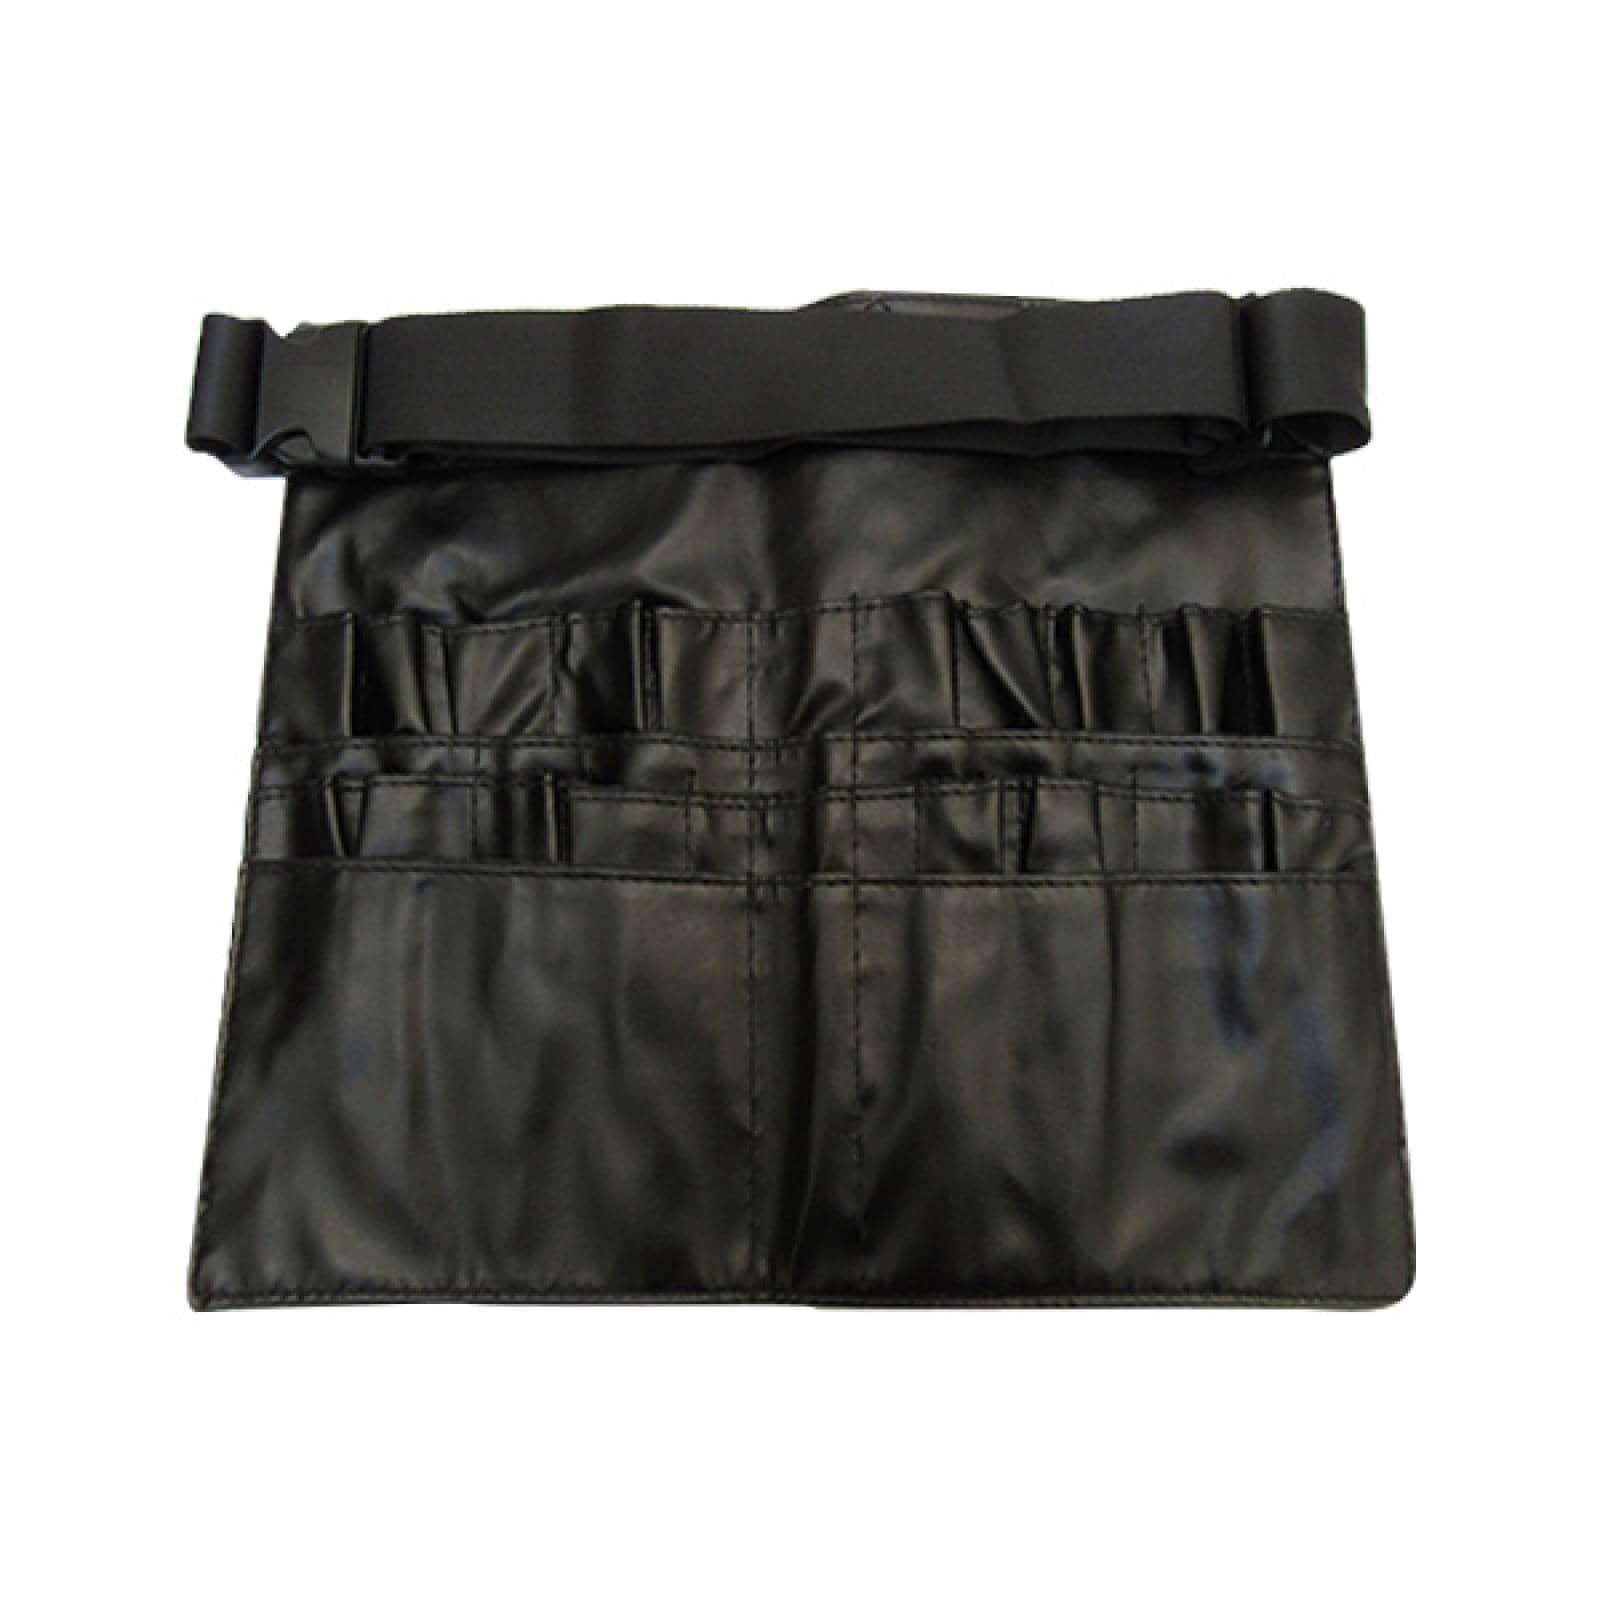 Cangurera negro brochas maquillaje cinta ajustable Nefertary Negro